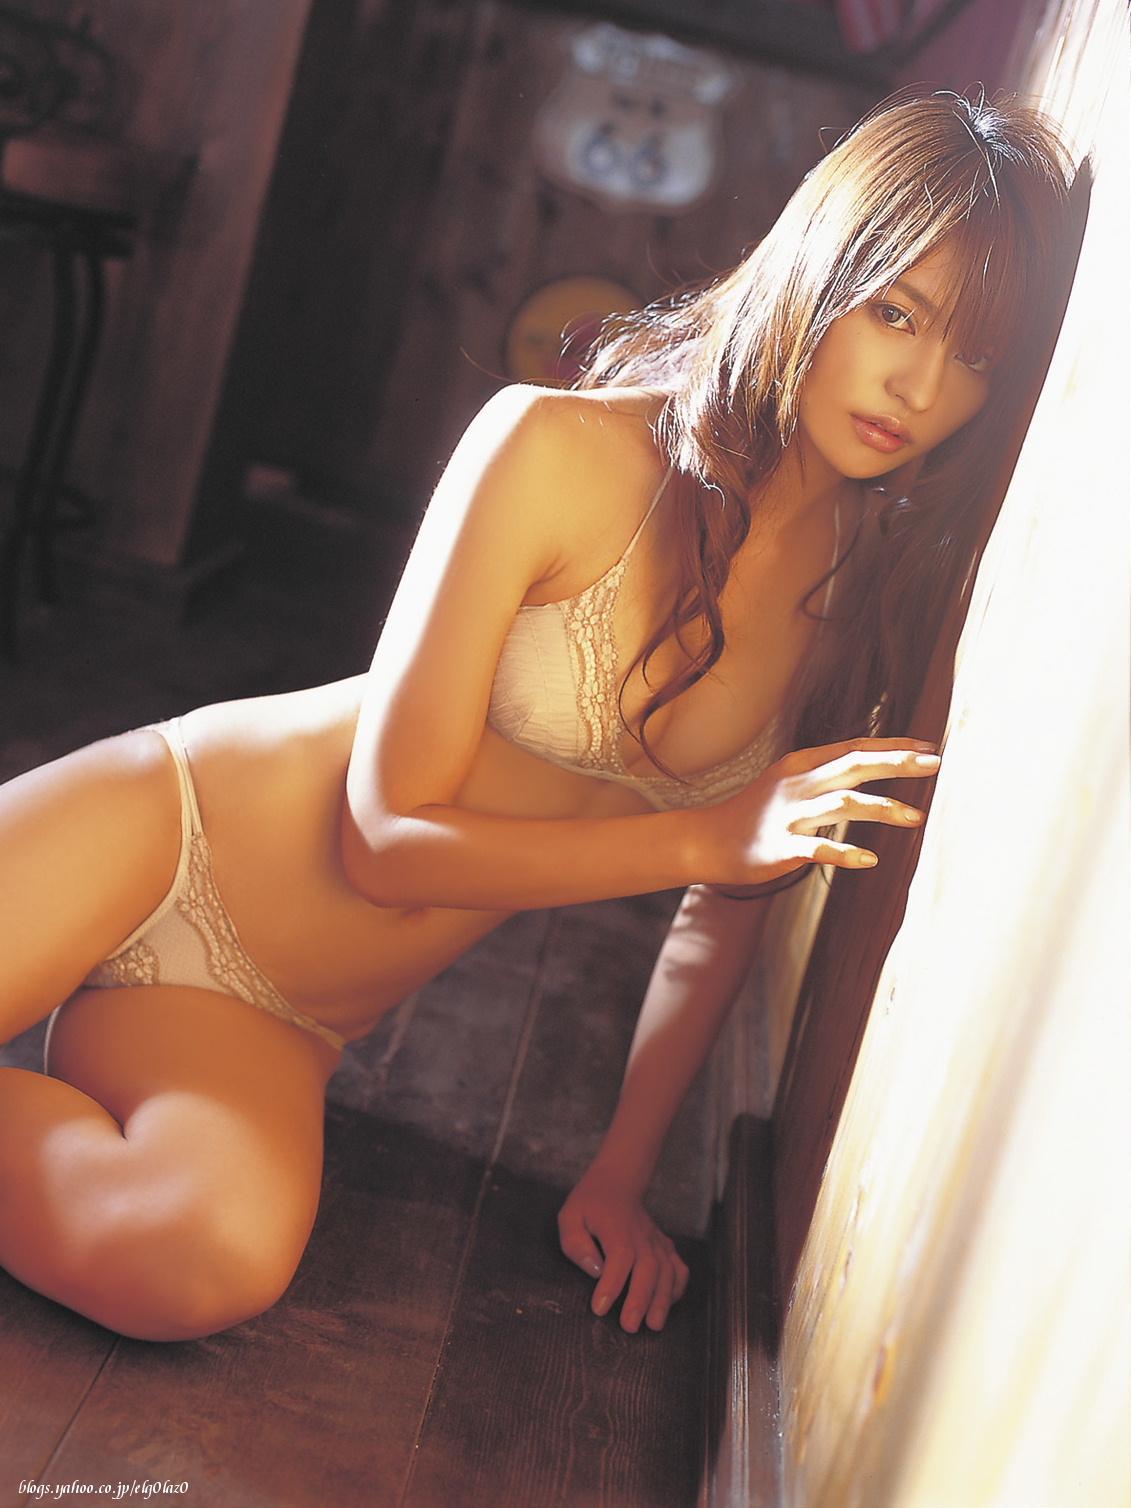 http://file.embraer170.blog.shinobi.jp/20110419.jpeg